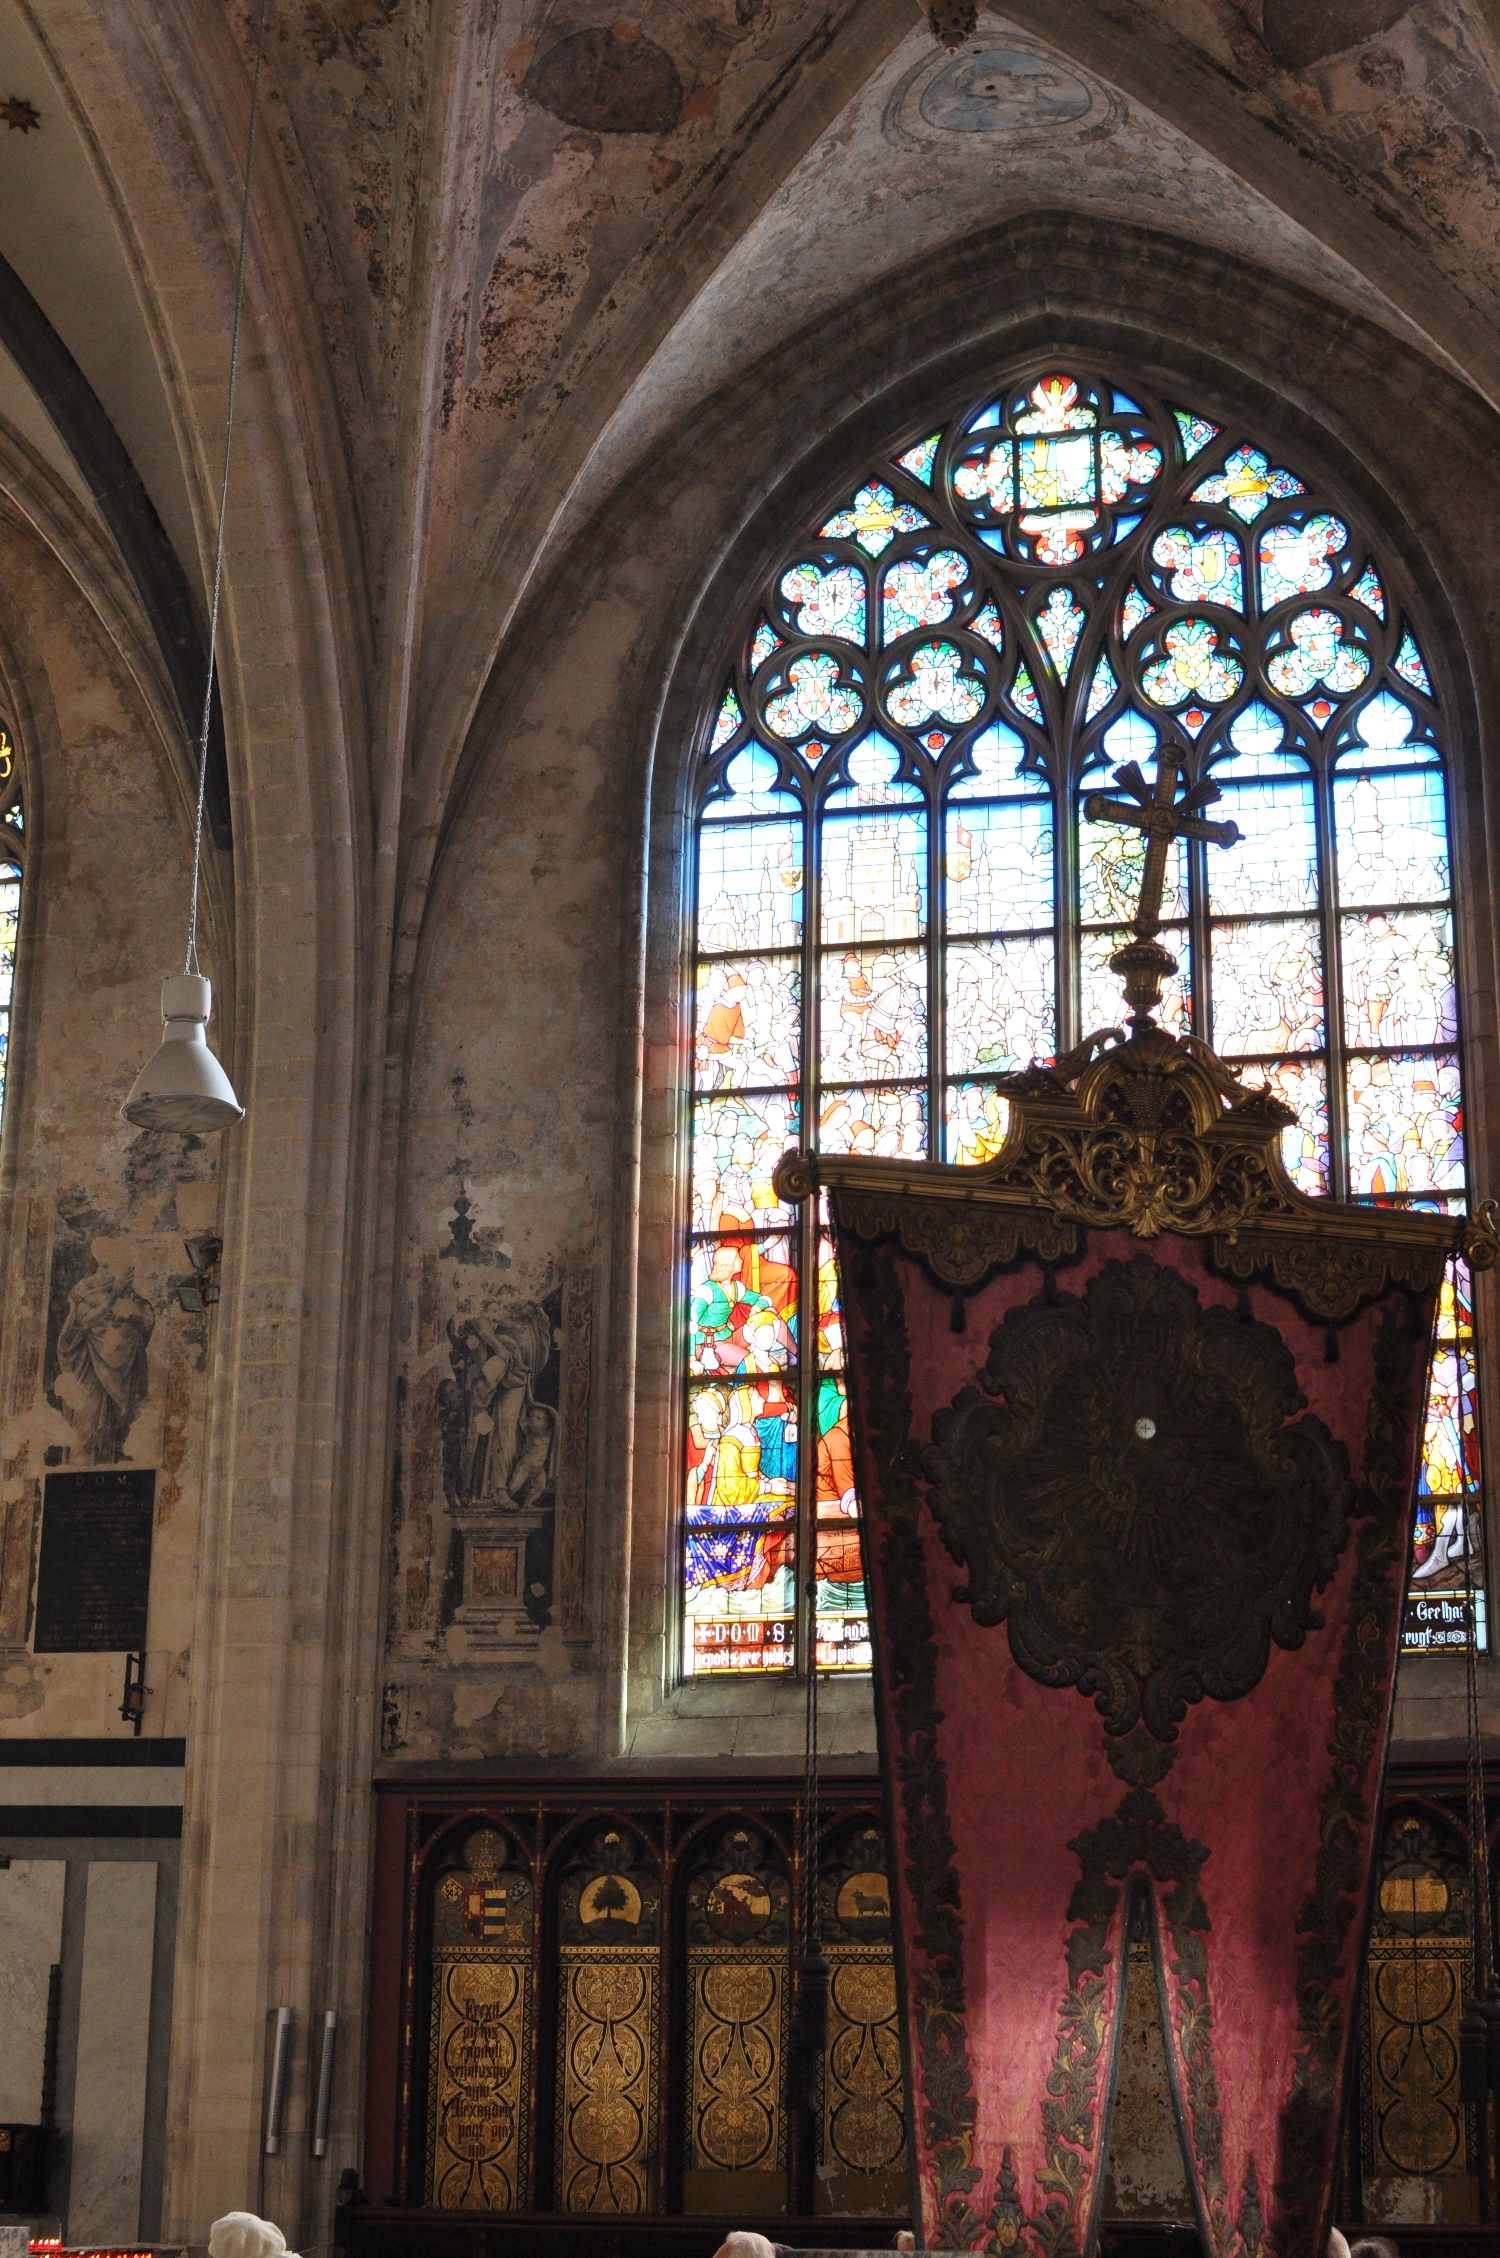 rocaille-blog-cattedrale-anversa-rubens-Onze-Lieve-Vrouwekathedraal-antwerpen-6